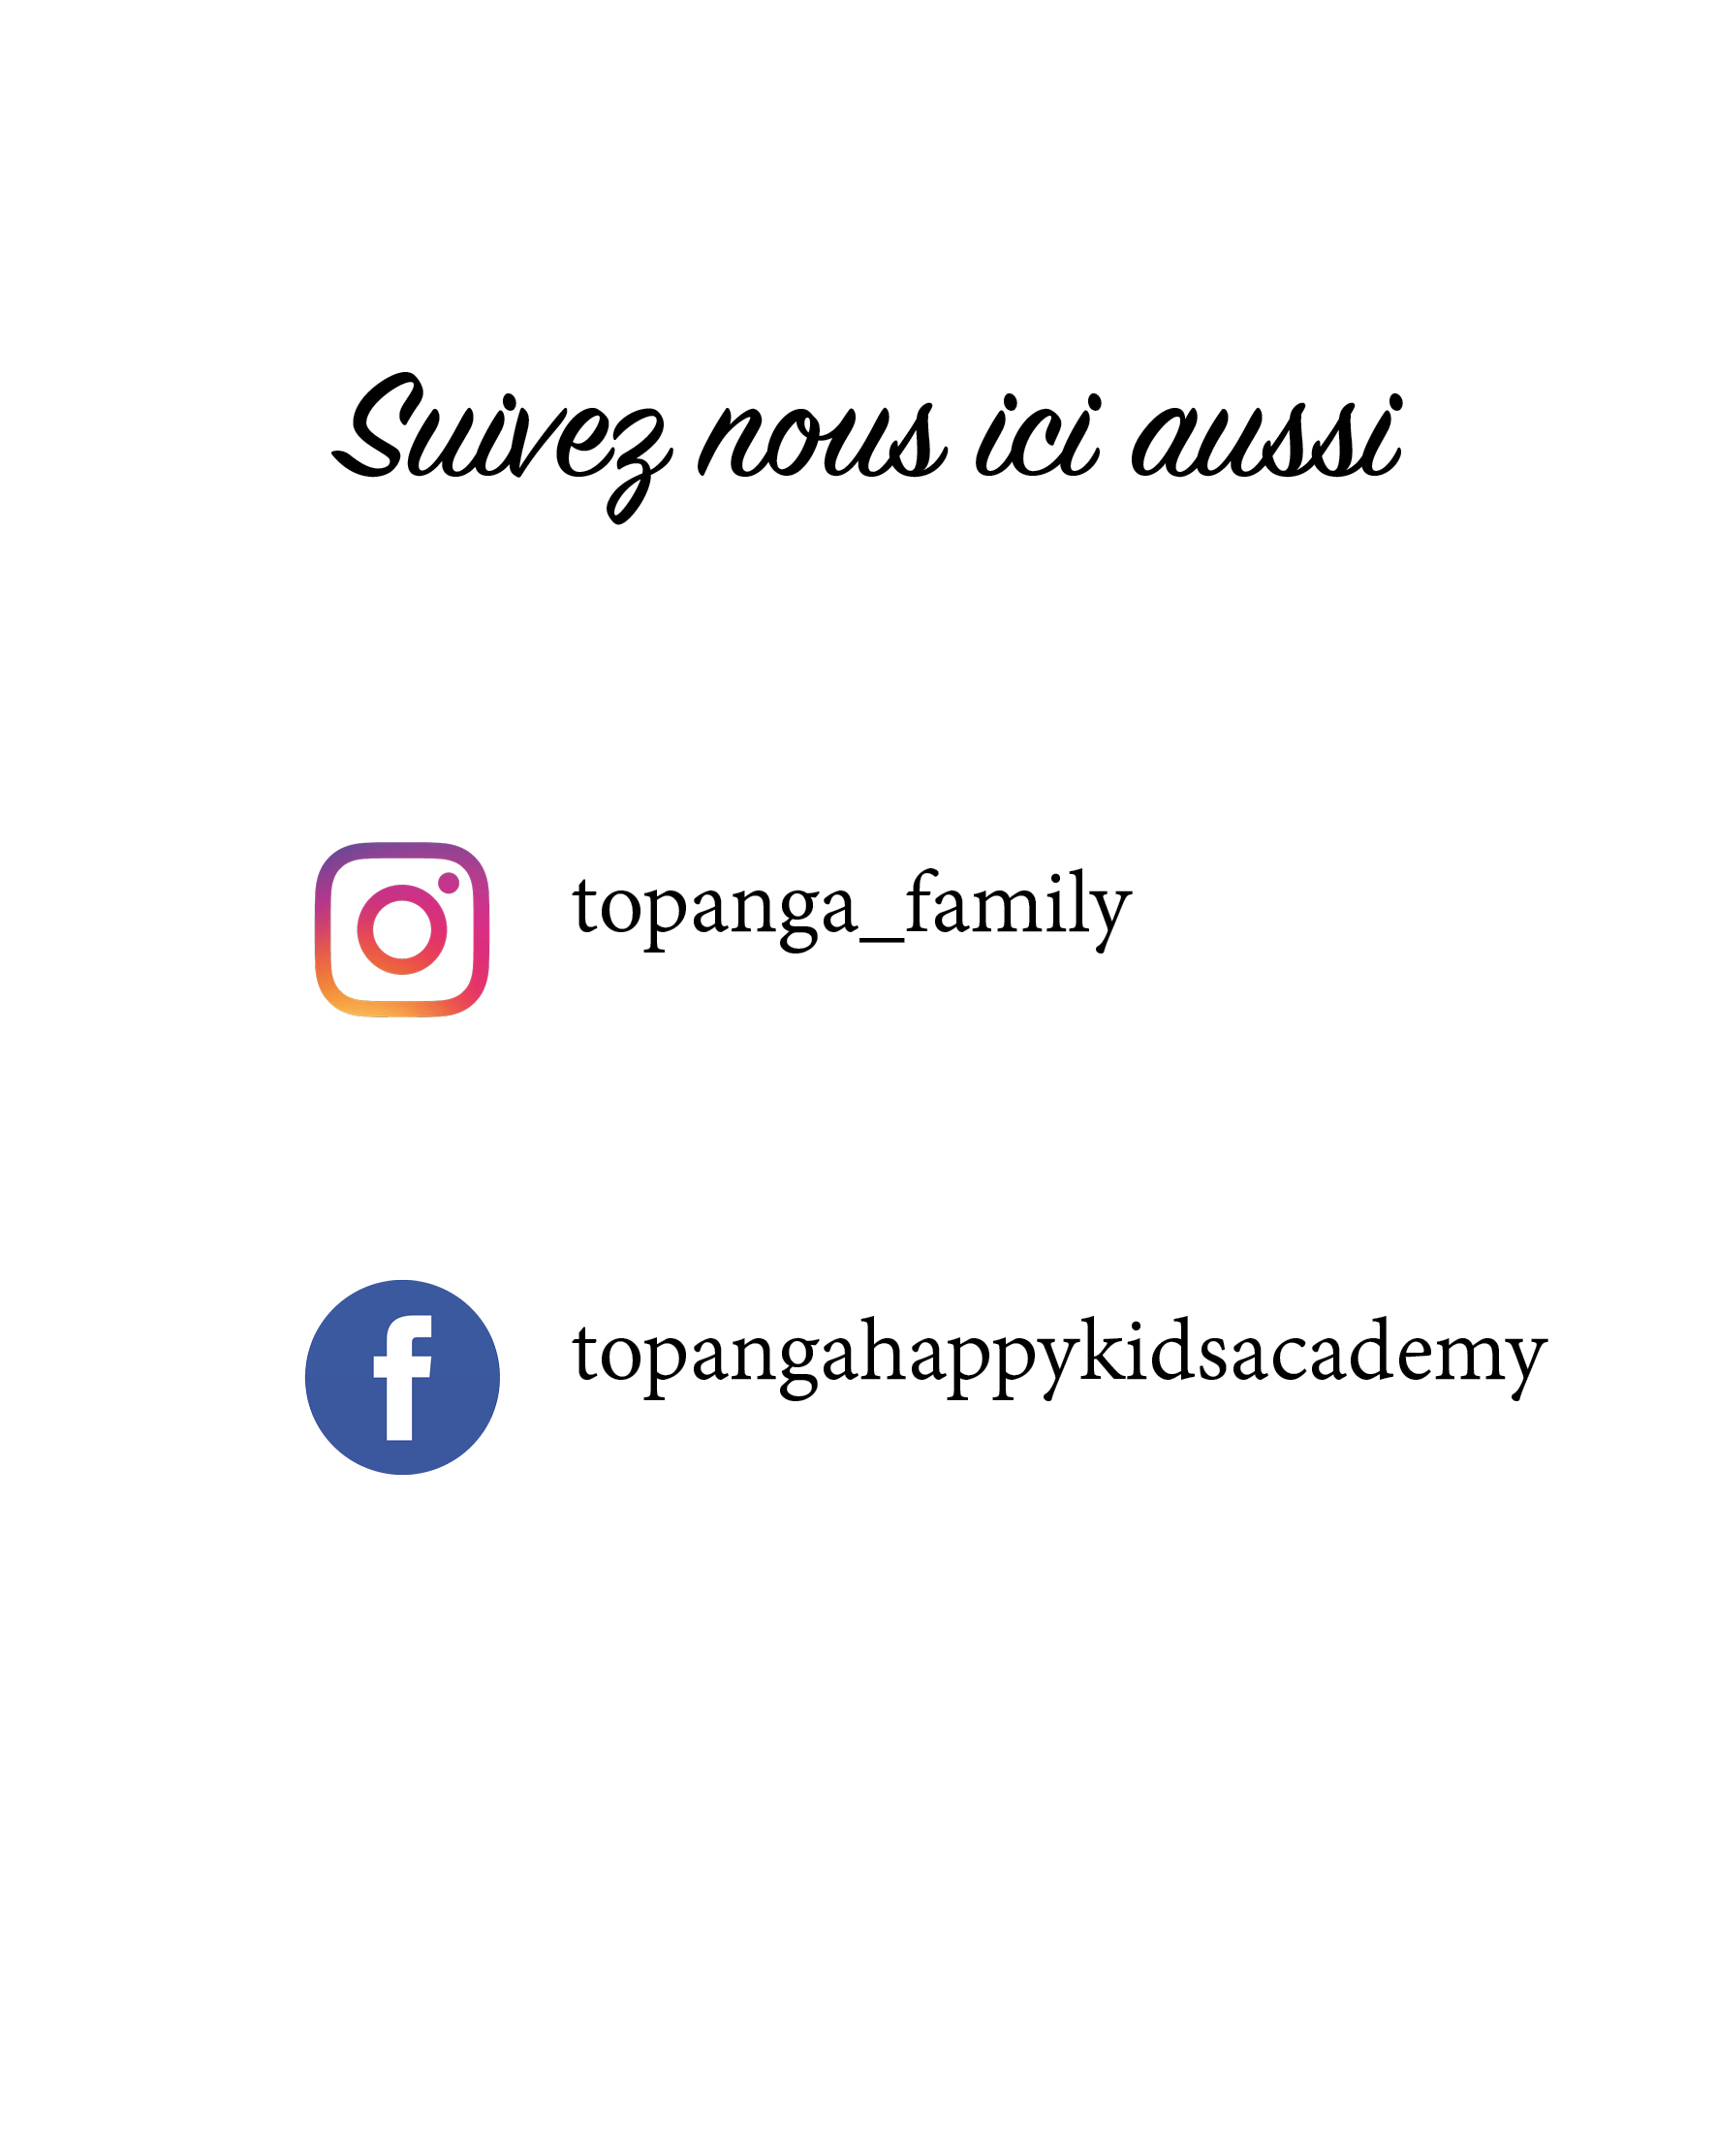 Topanga-reseaux.jpg